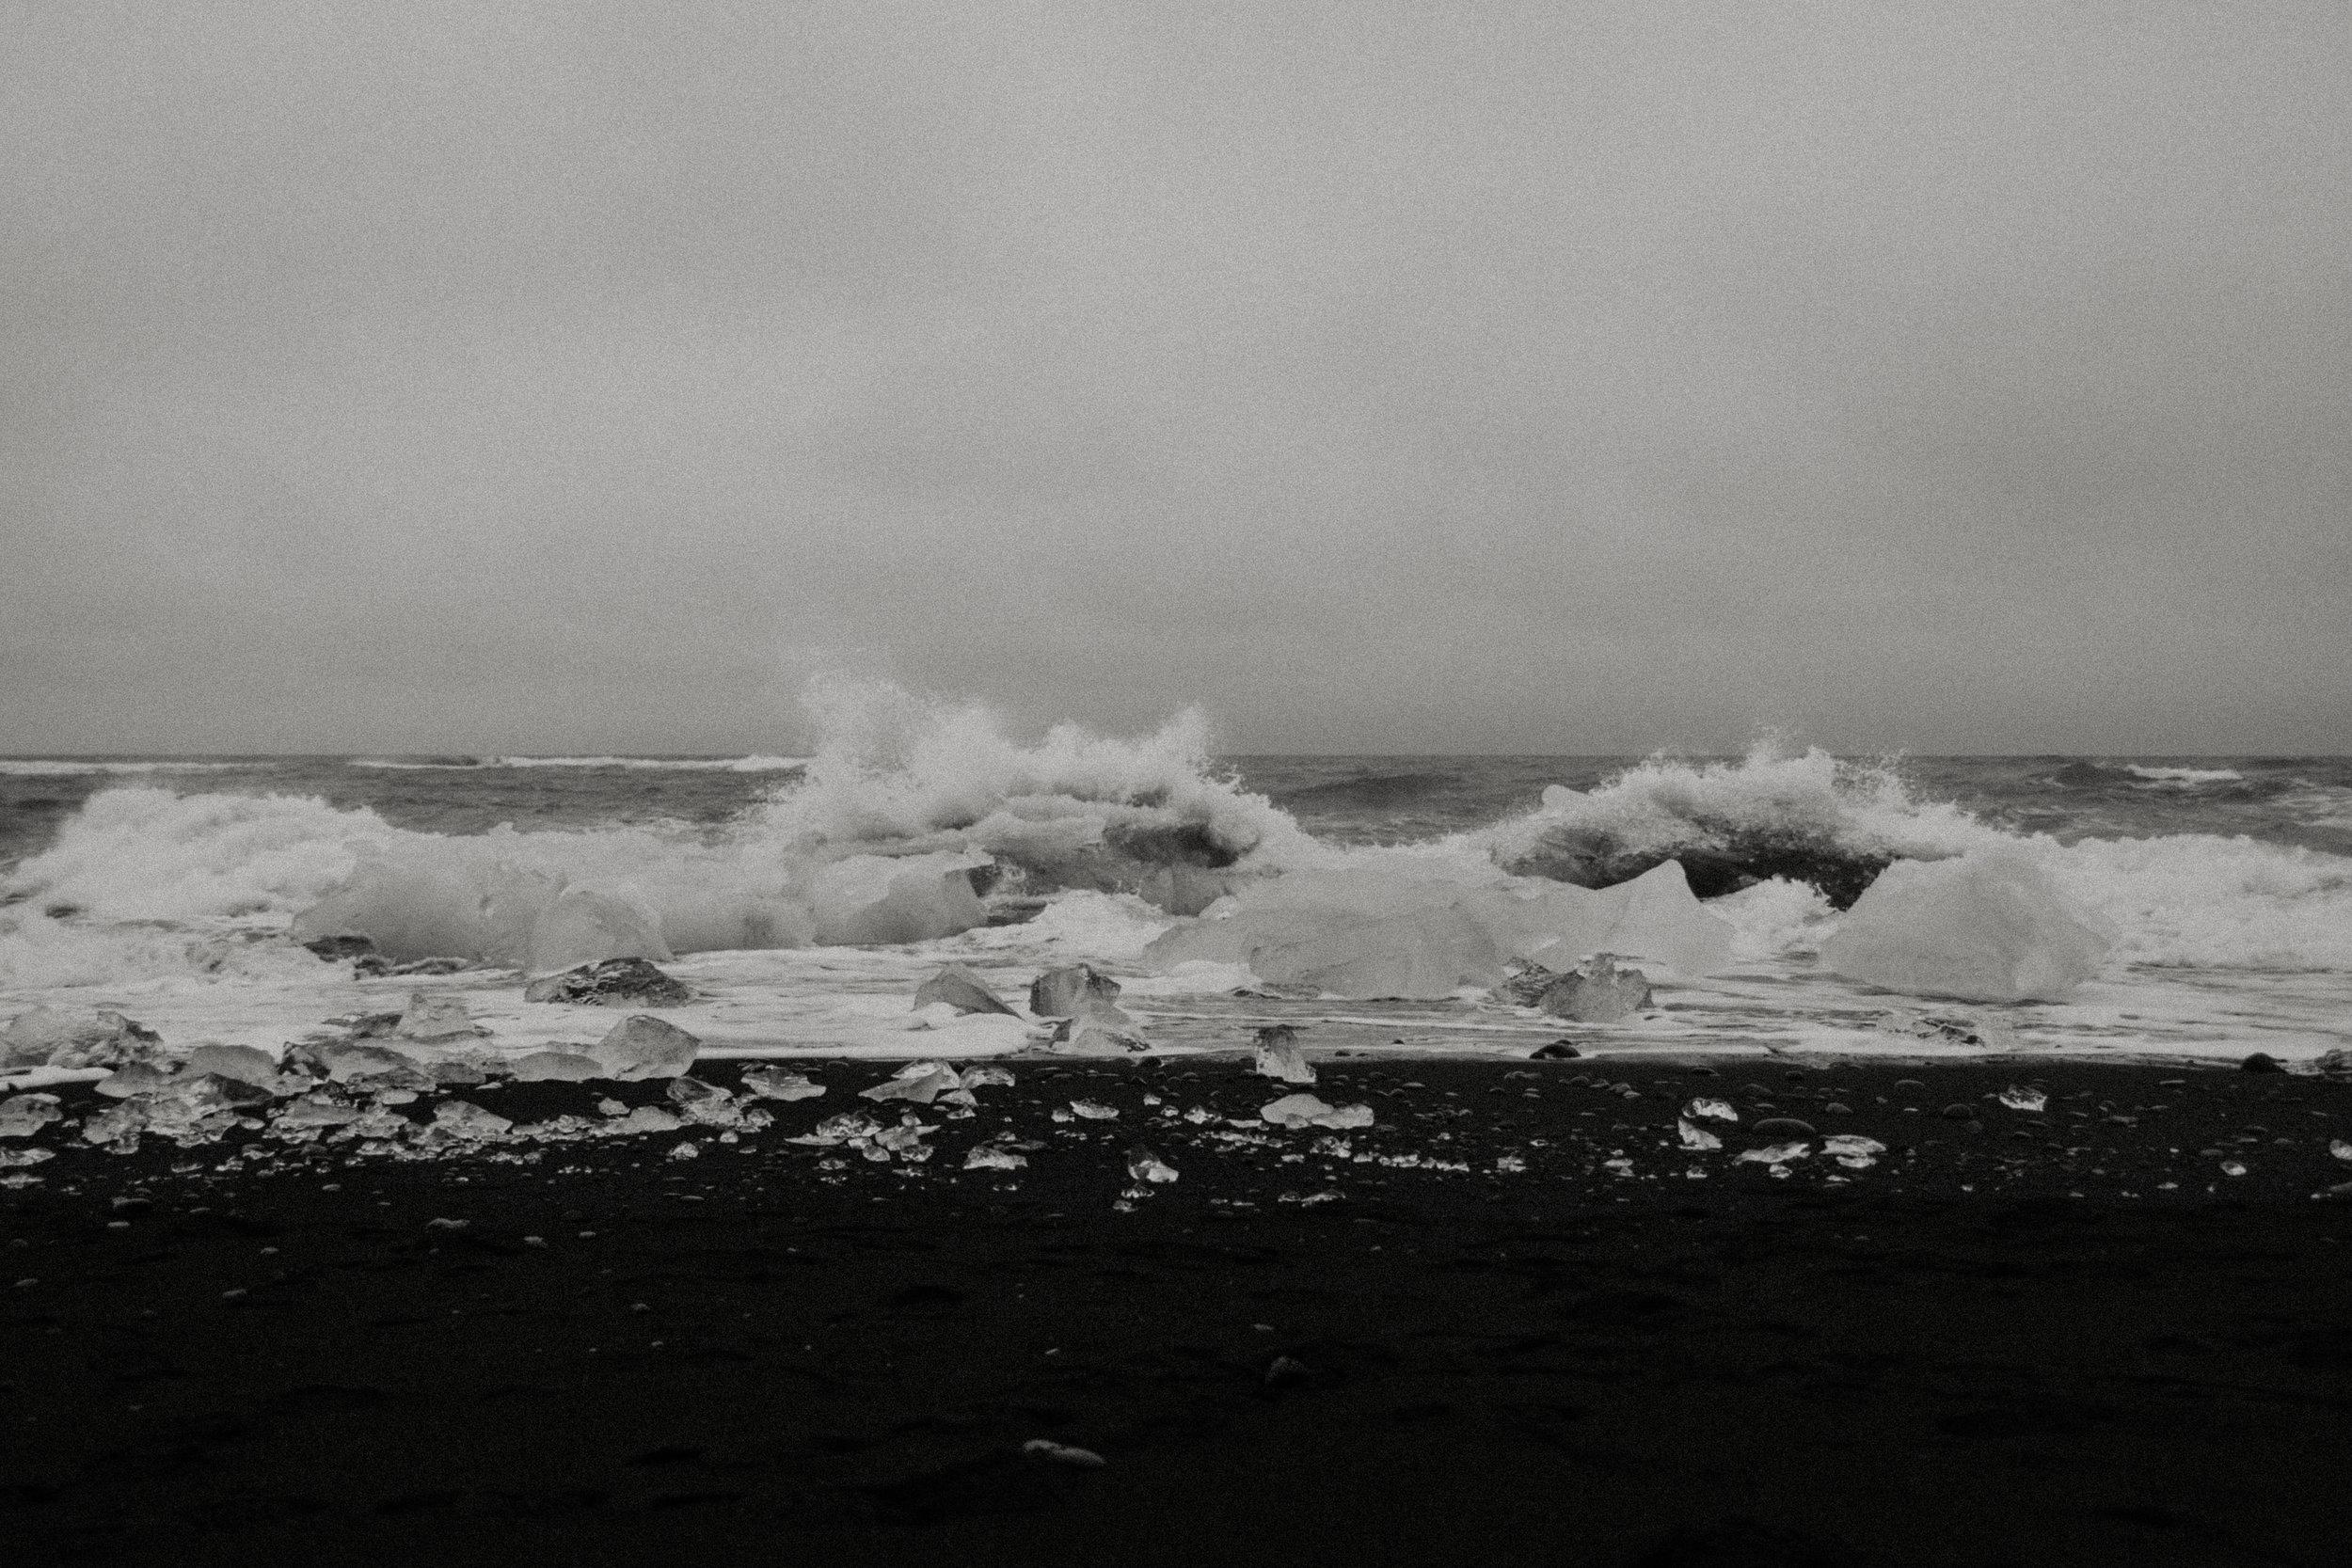 Iceland-honeymoon-4492.jpg